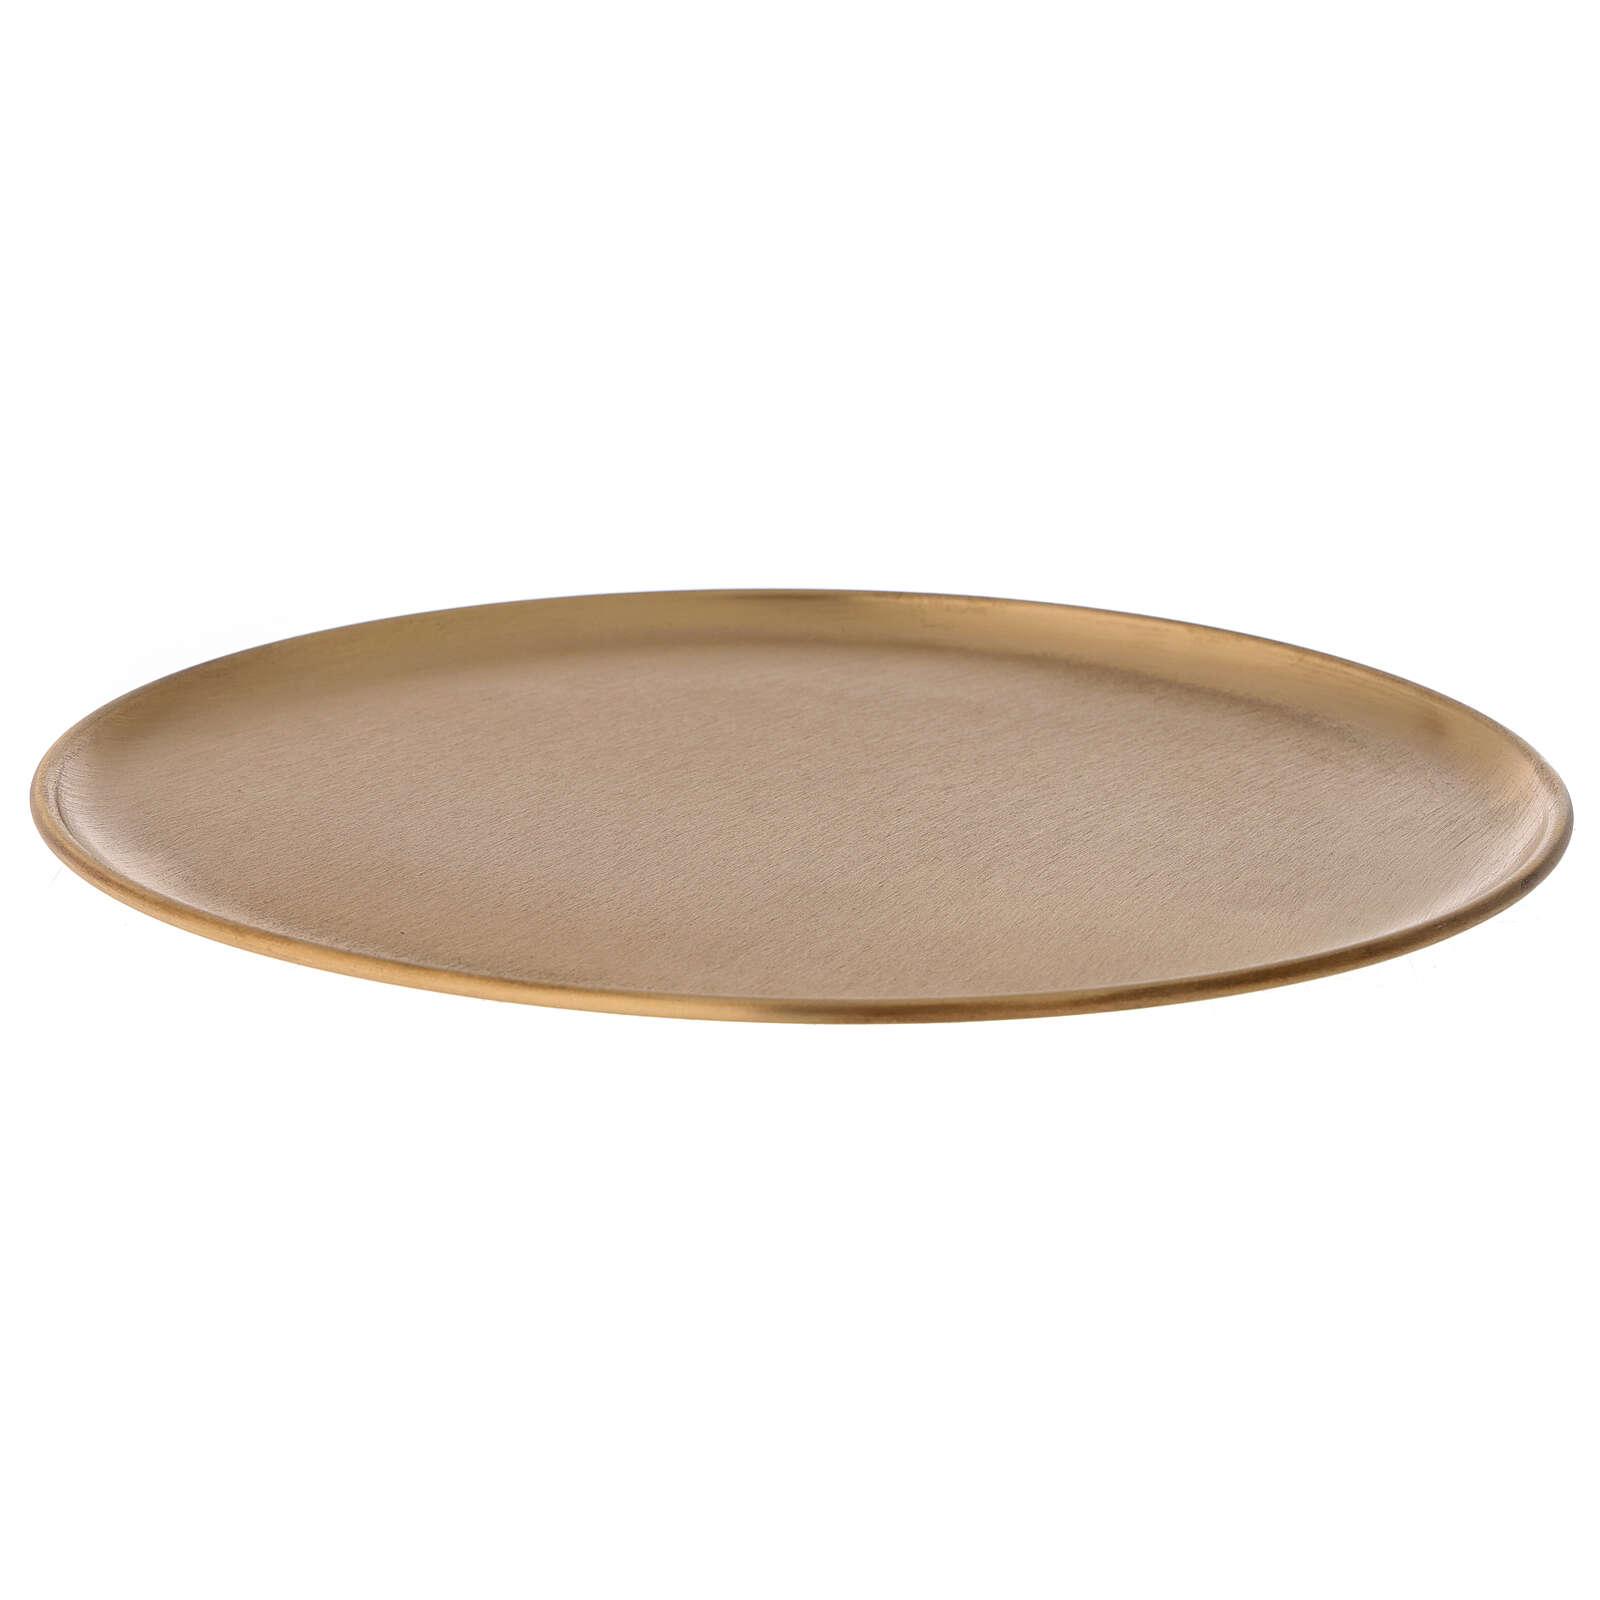 Plato portavela diámetro 21 cm latón dorado satinado 3